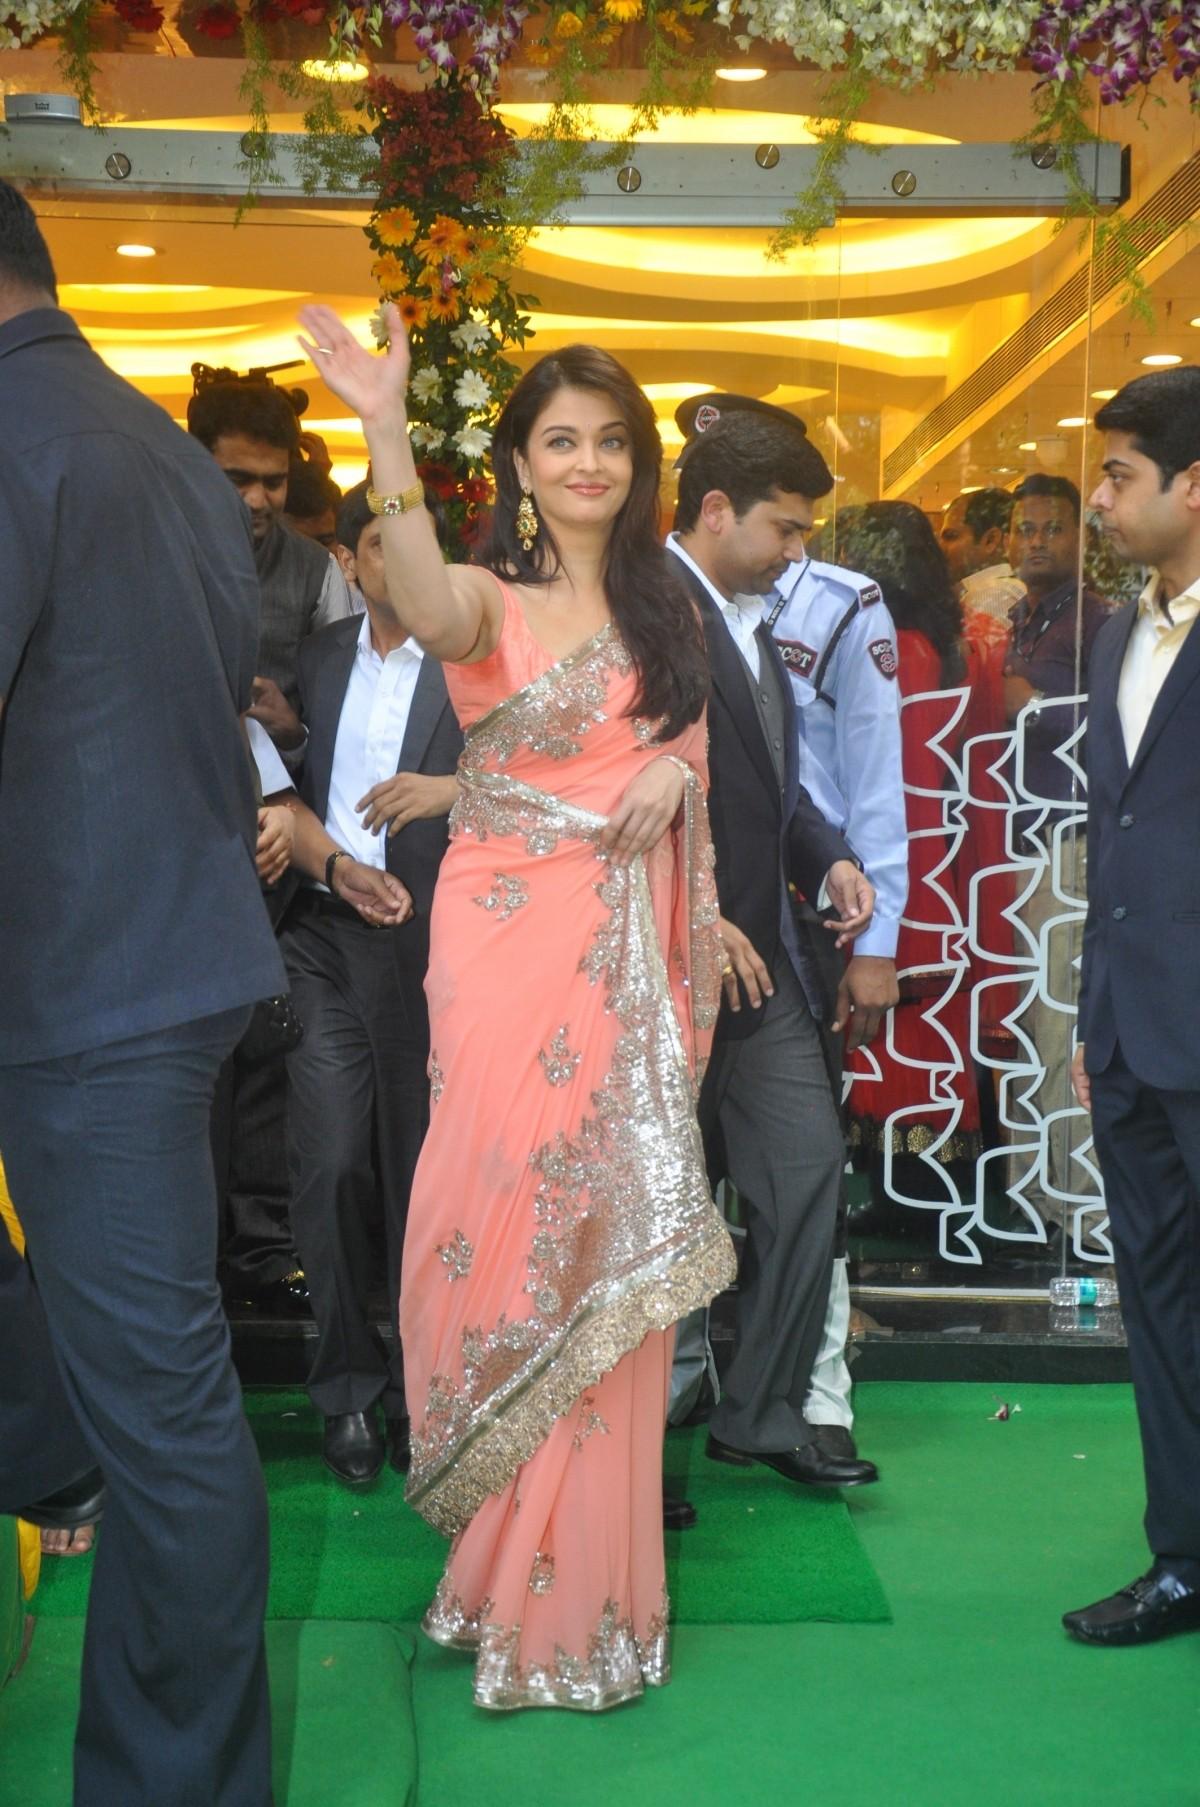 Aishwarya Rai Bachchan inaugurates Kalyan Jewellers New Store